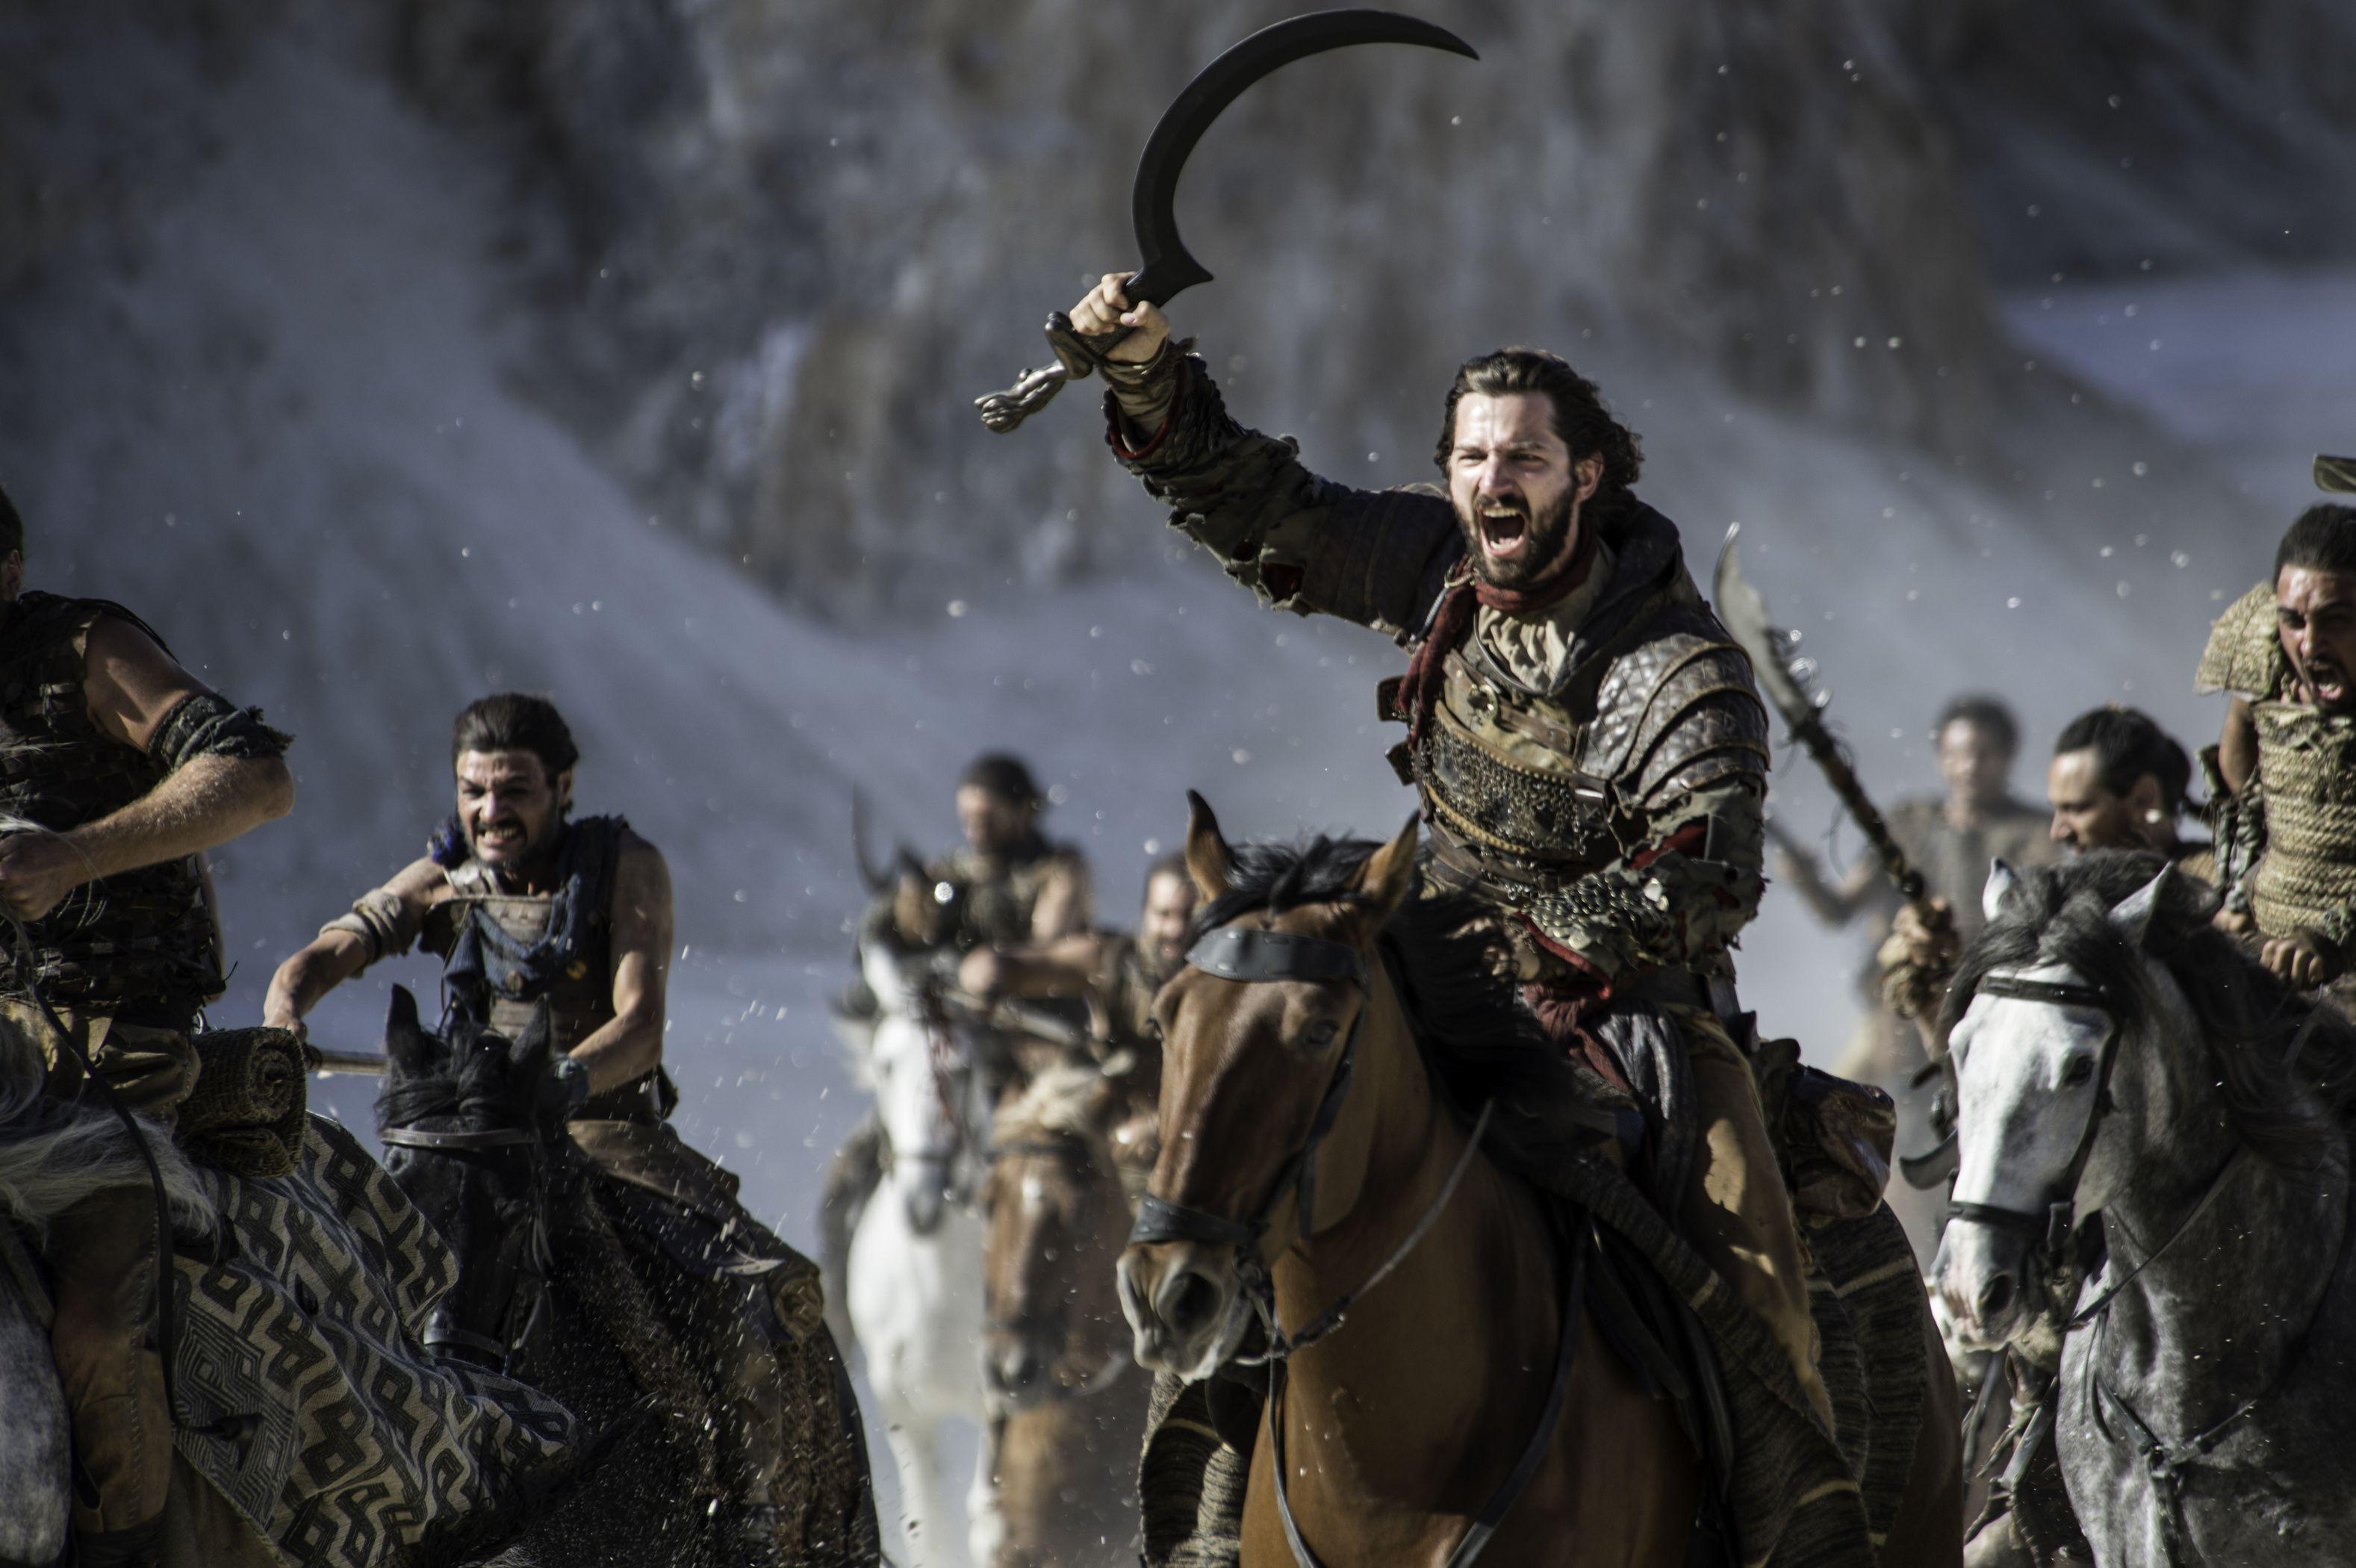 game-of-thrones-battle-of-the-bastards-image-dothraki